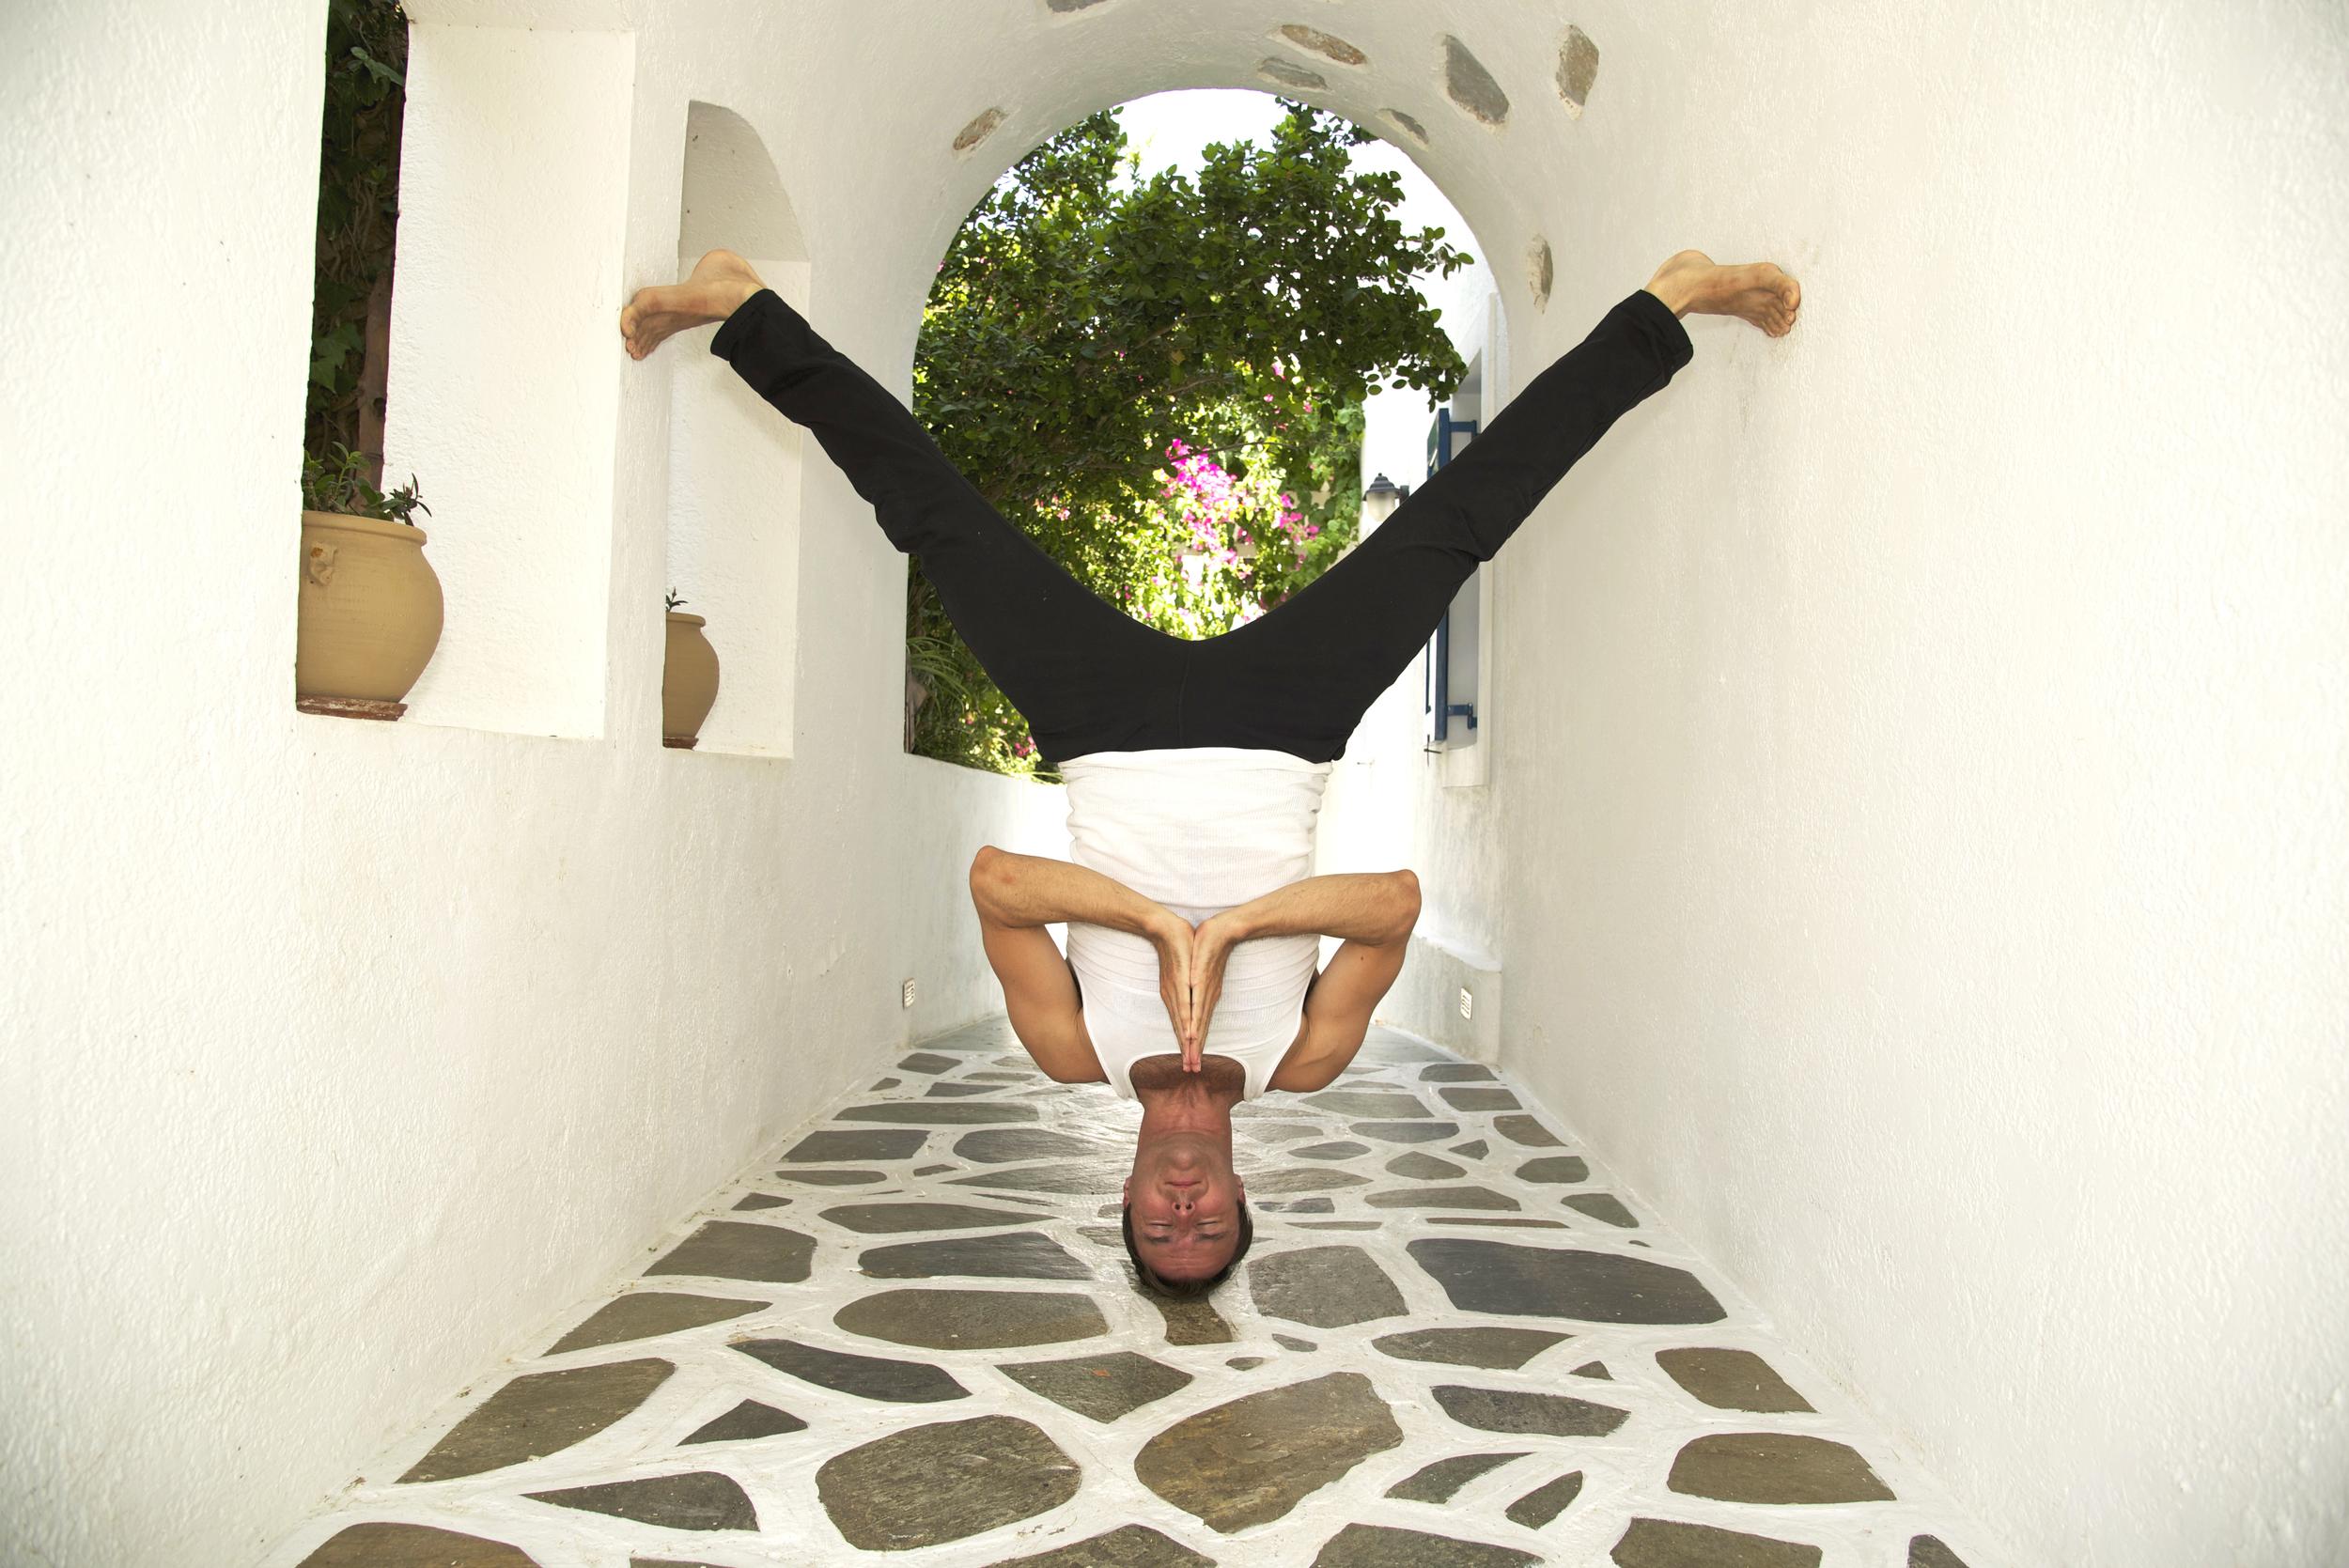 Garth - No Limbed Head Balance - Prayer - Greece.jpg